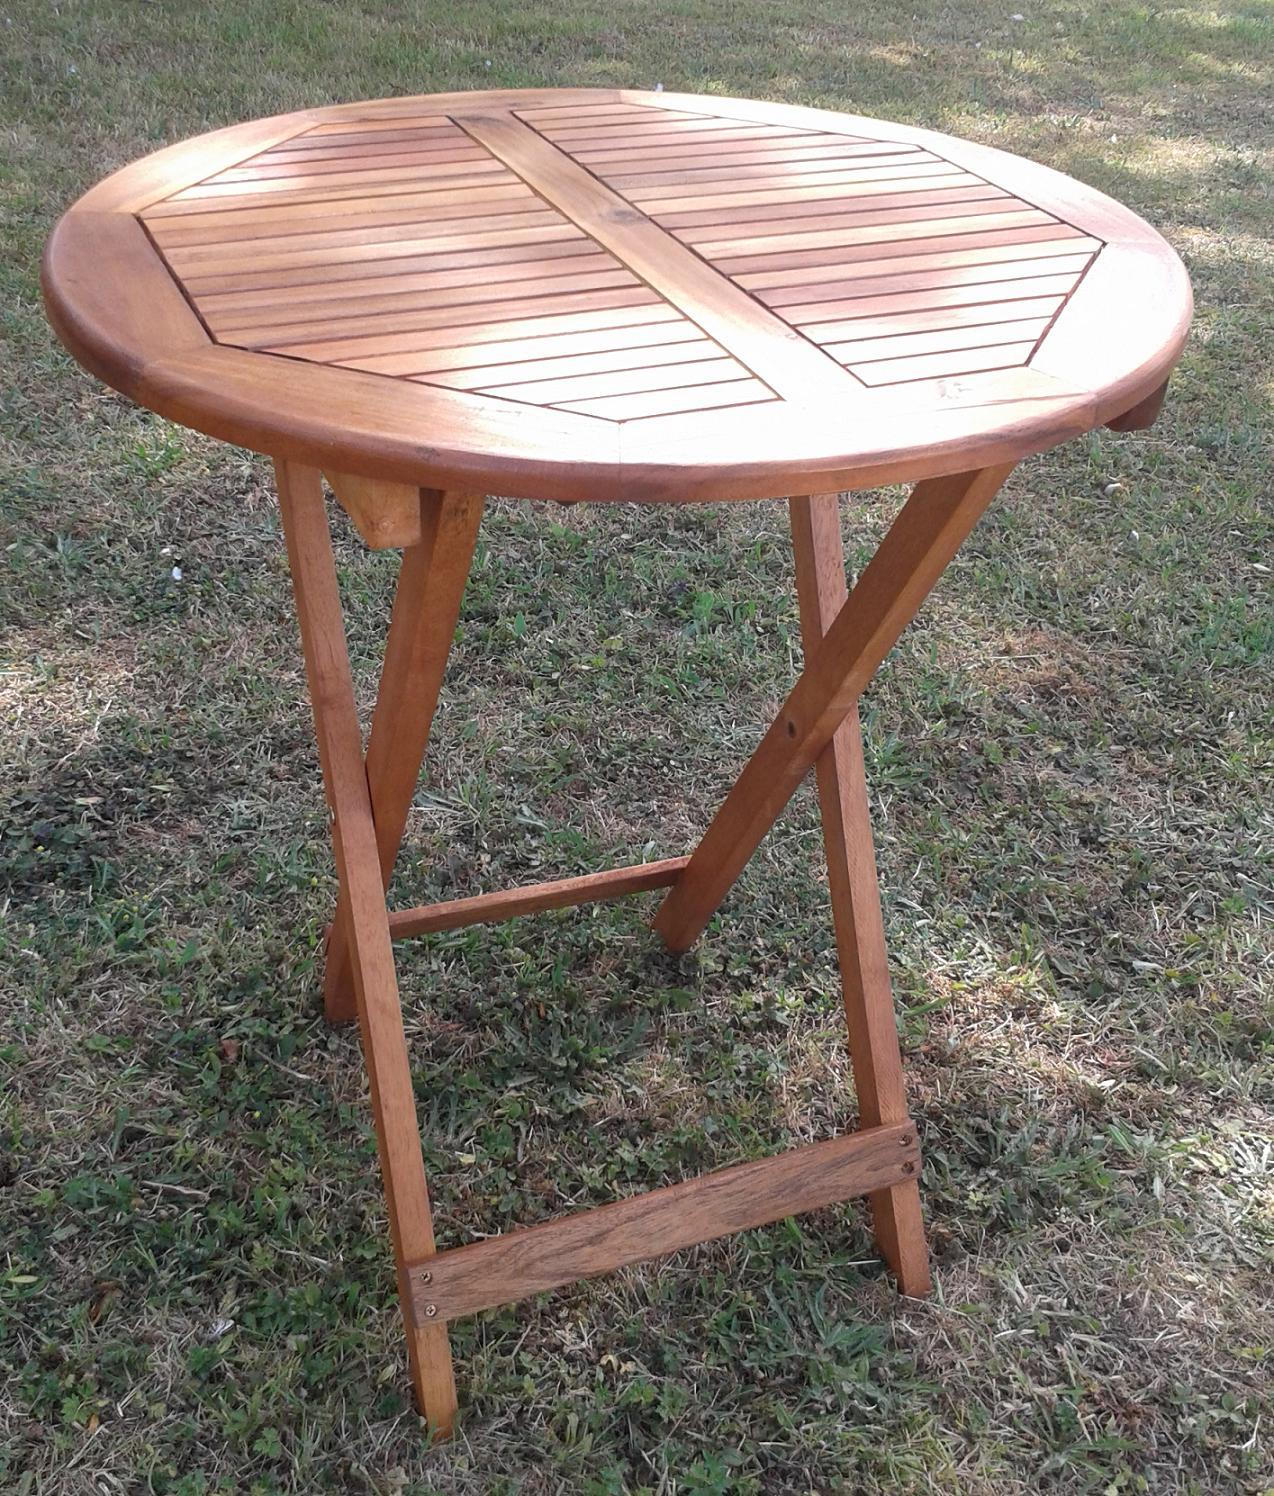 acacia wood folding table for garden amp patio 75cm on Circular Folding Dining Table id=16596